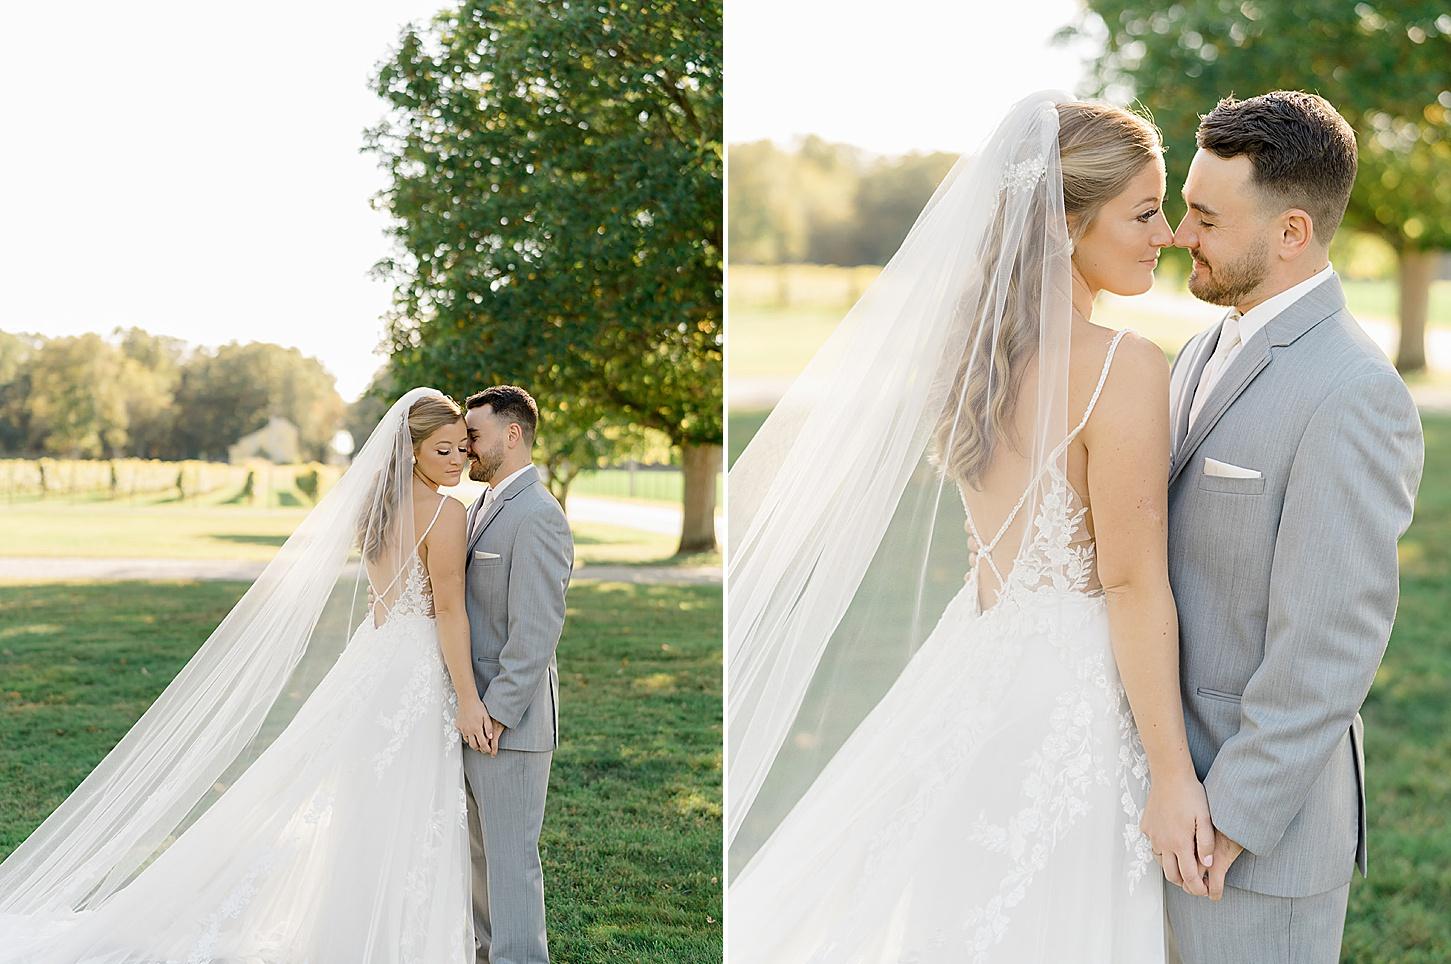 Valenzano Winery Vitners Pavillion Wedding Photography by Magdalena Studios 0029